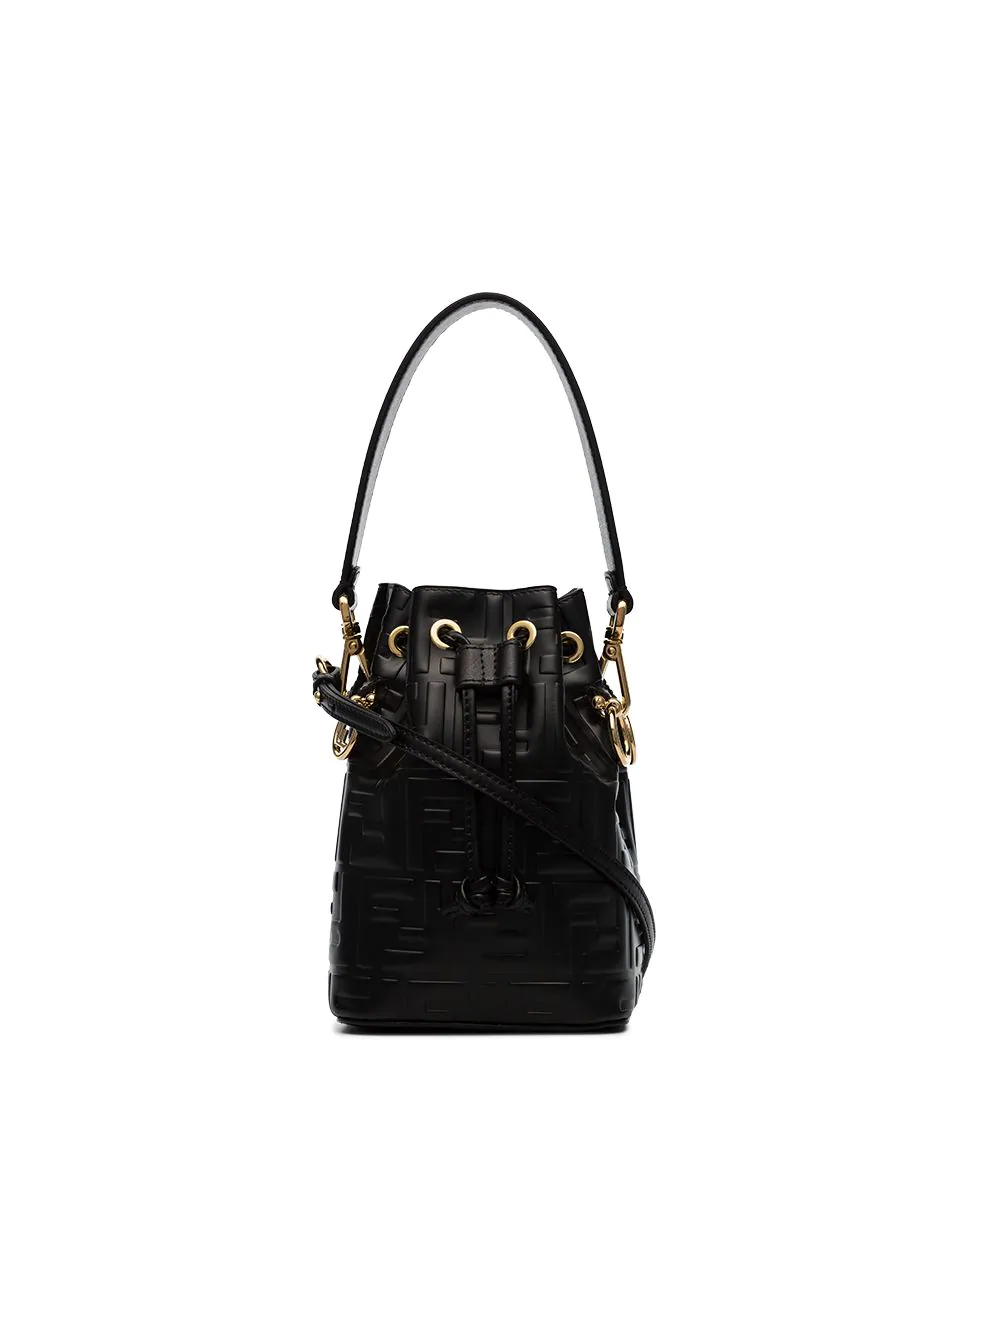 Fendi Black Mon Tresor Mini Leather Bucket Bag  92073ecc7c978